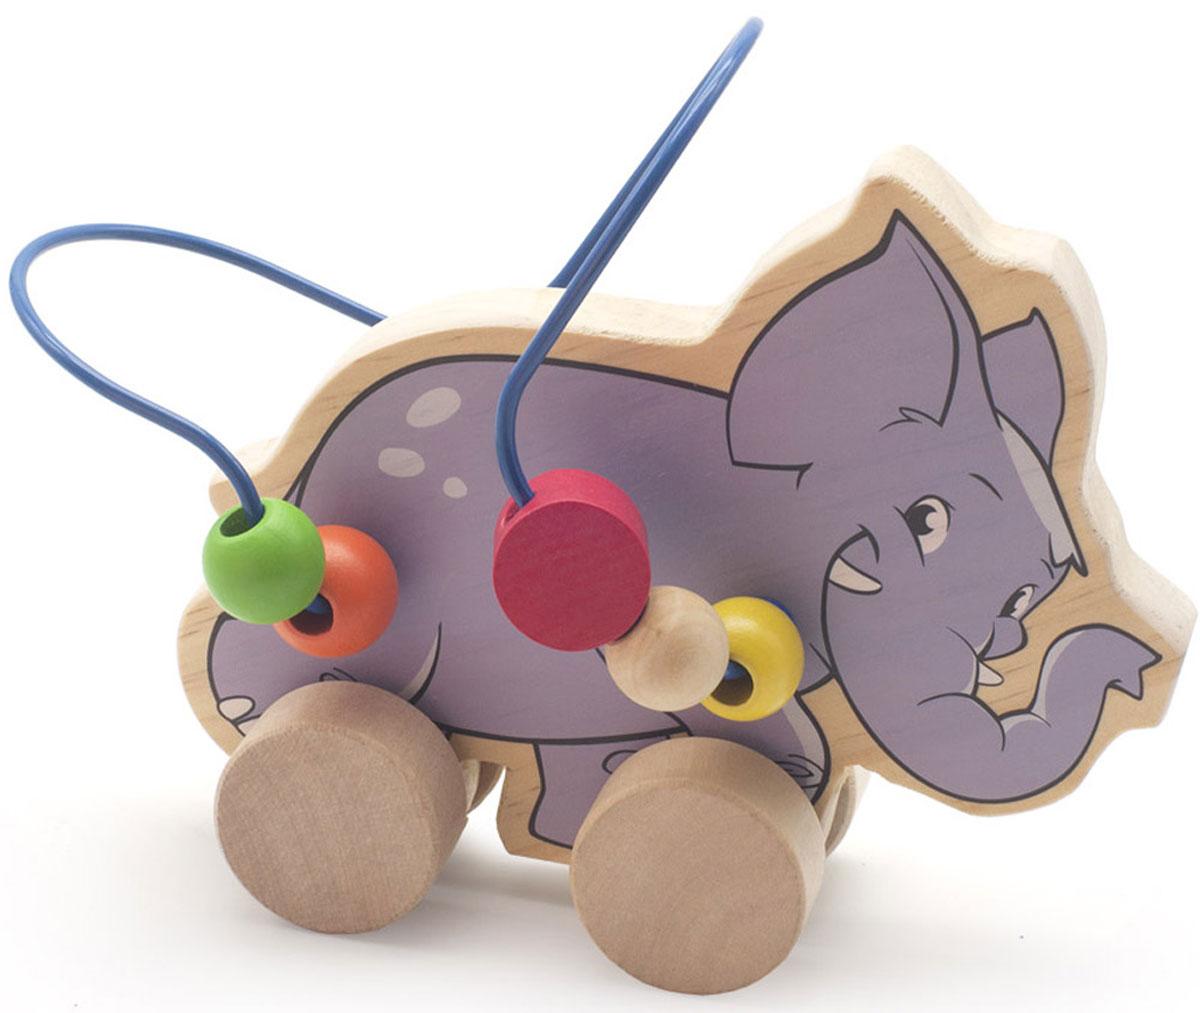 Мир деревянных игрушек Лабиринт-каталка Слон игрушка мир деревянных игрушек лабиринт буренка д384